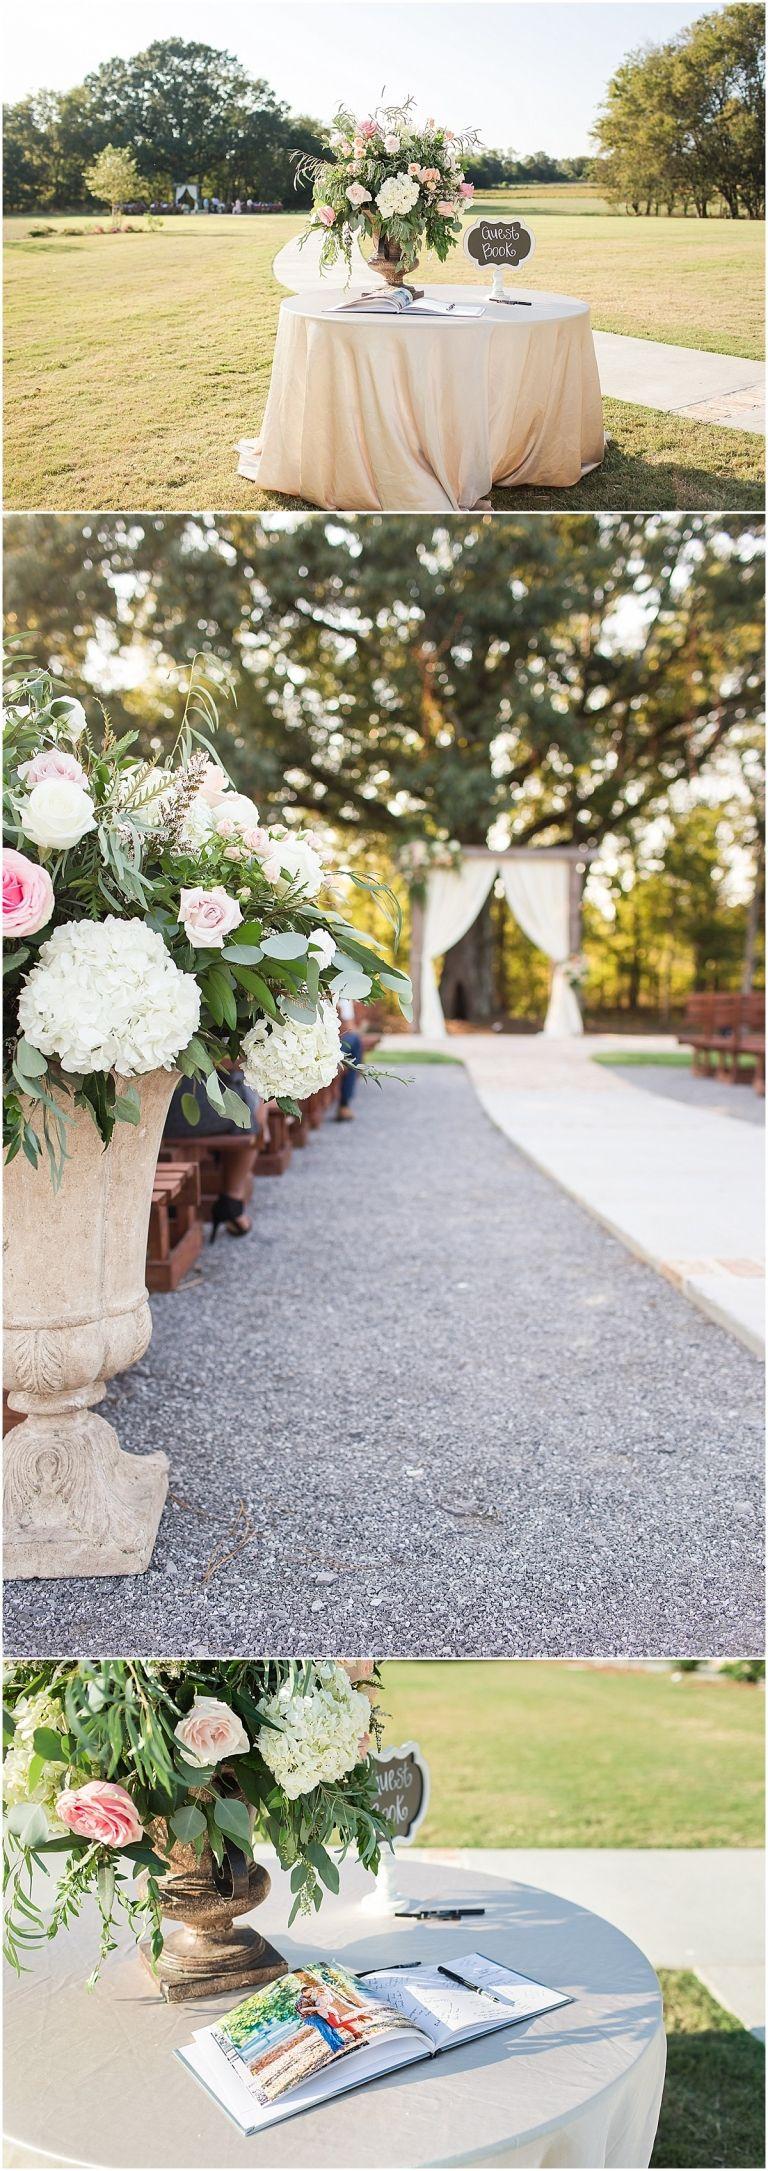 Bridal Bouquet,Bride and Groom rings,Bridesmaids,Bridget ...